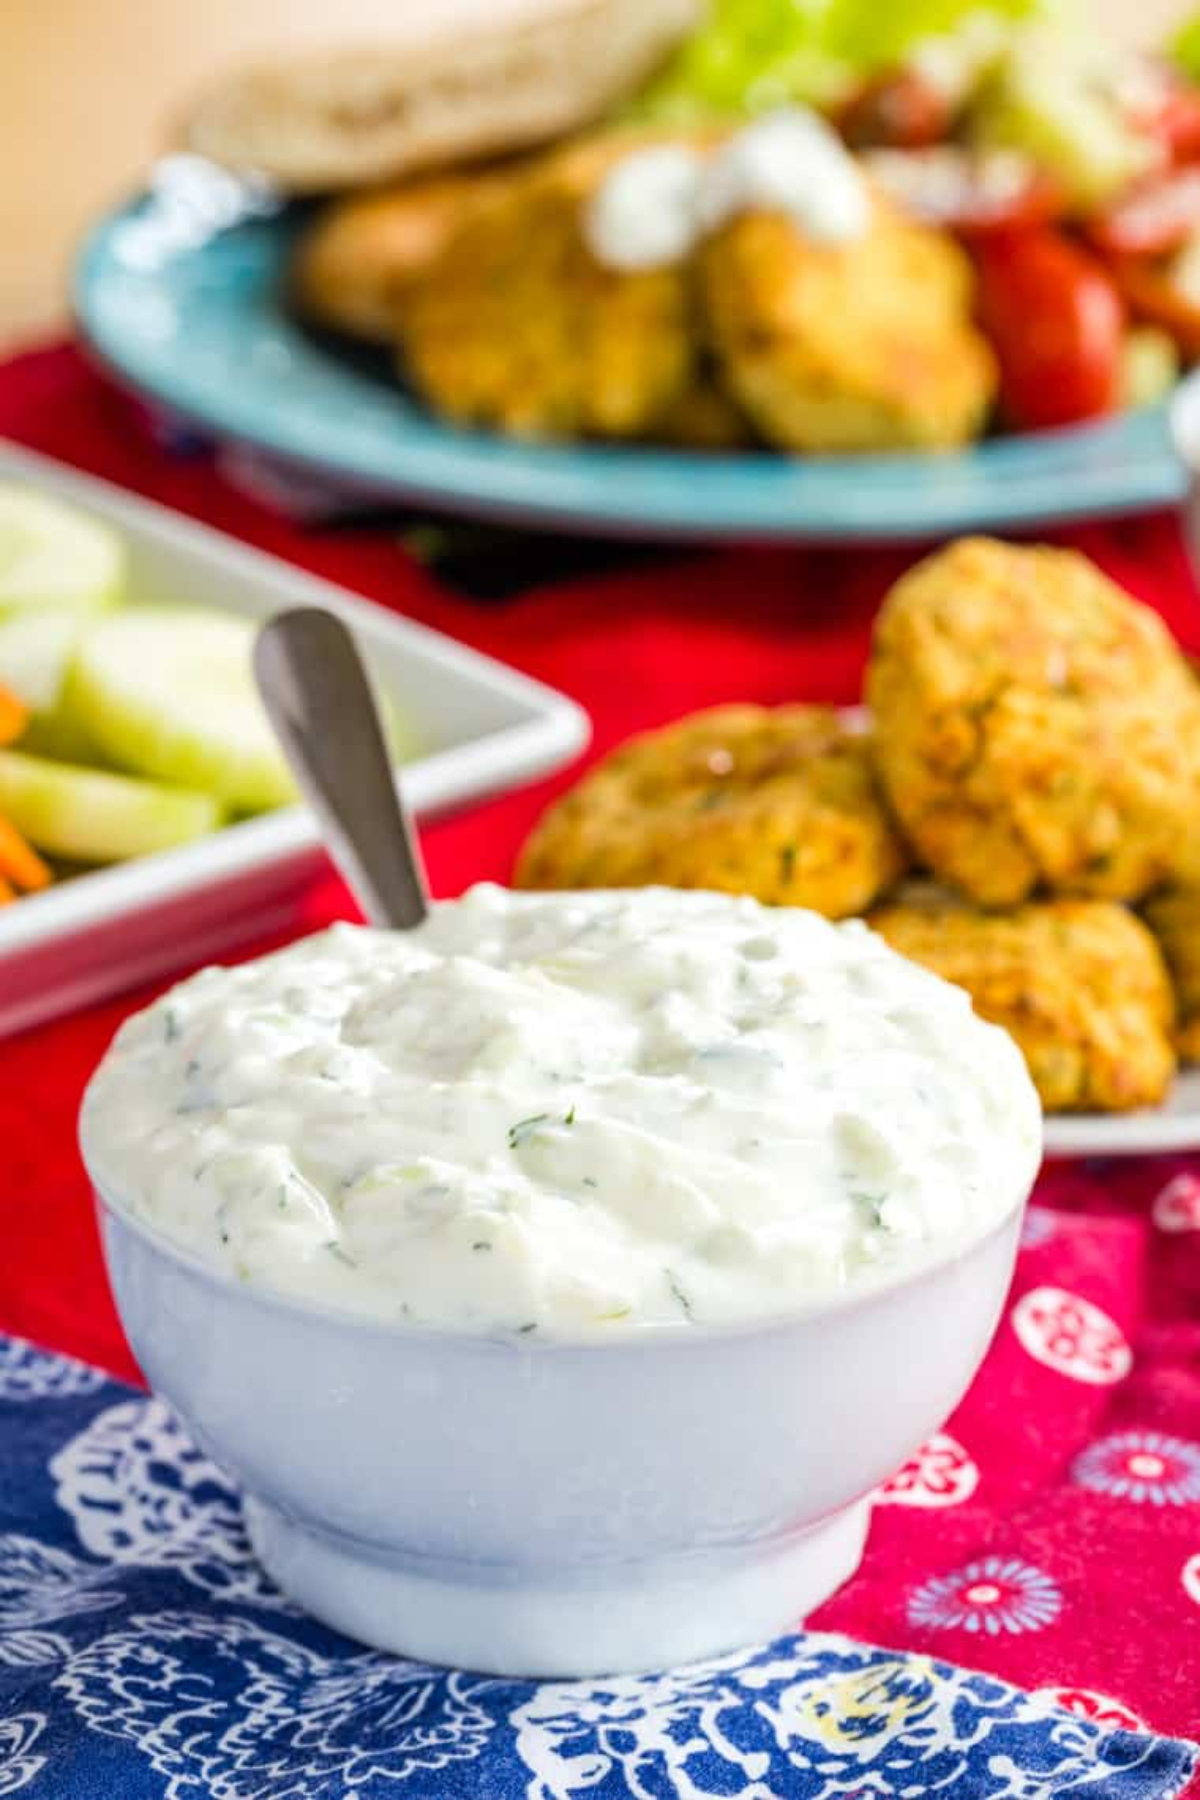 Easy Greek Tzatziki Sauce in a bowl to spoon onto Mediterranean dishes